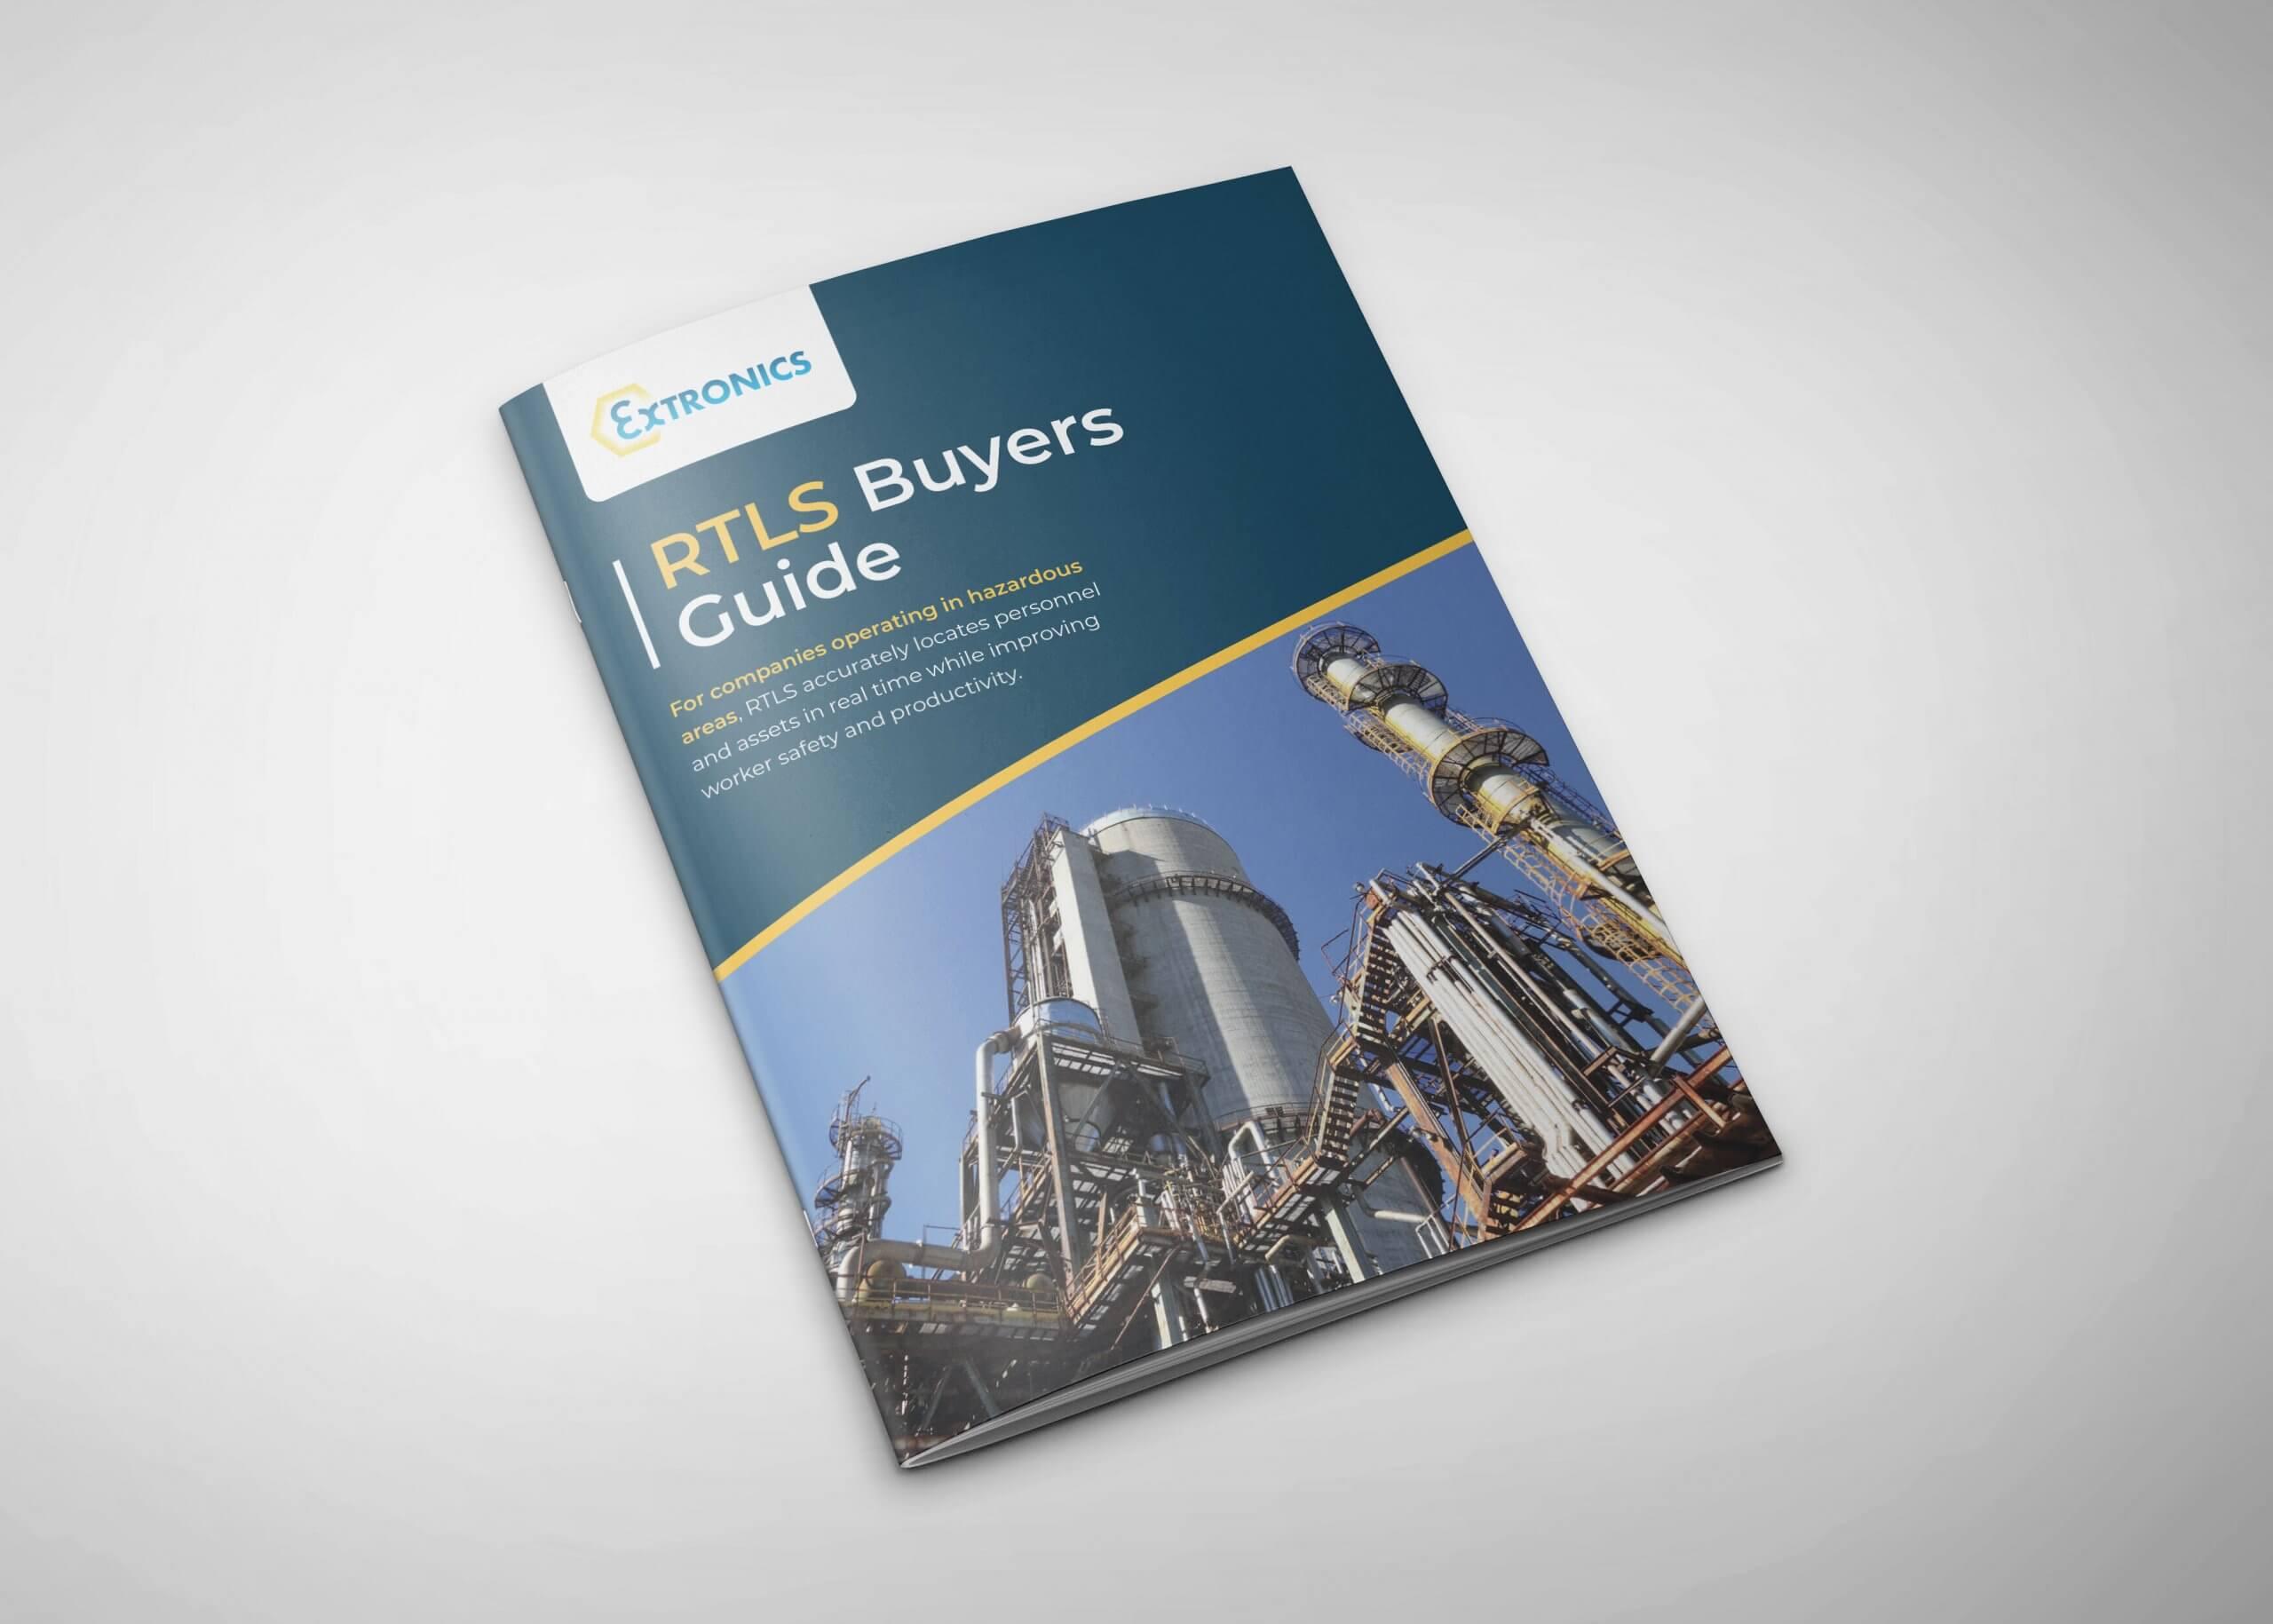 RTLS Buyers Guide